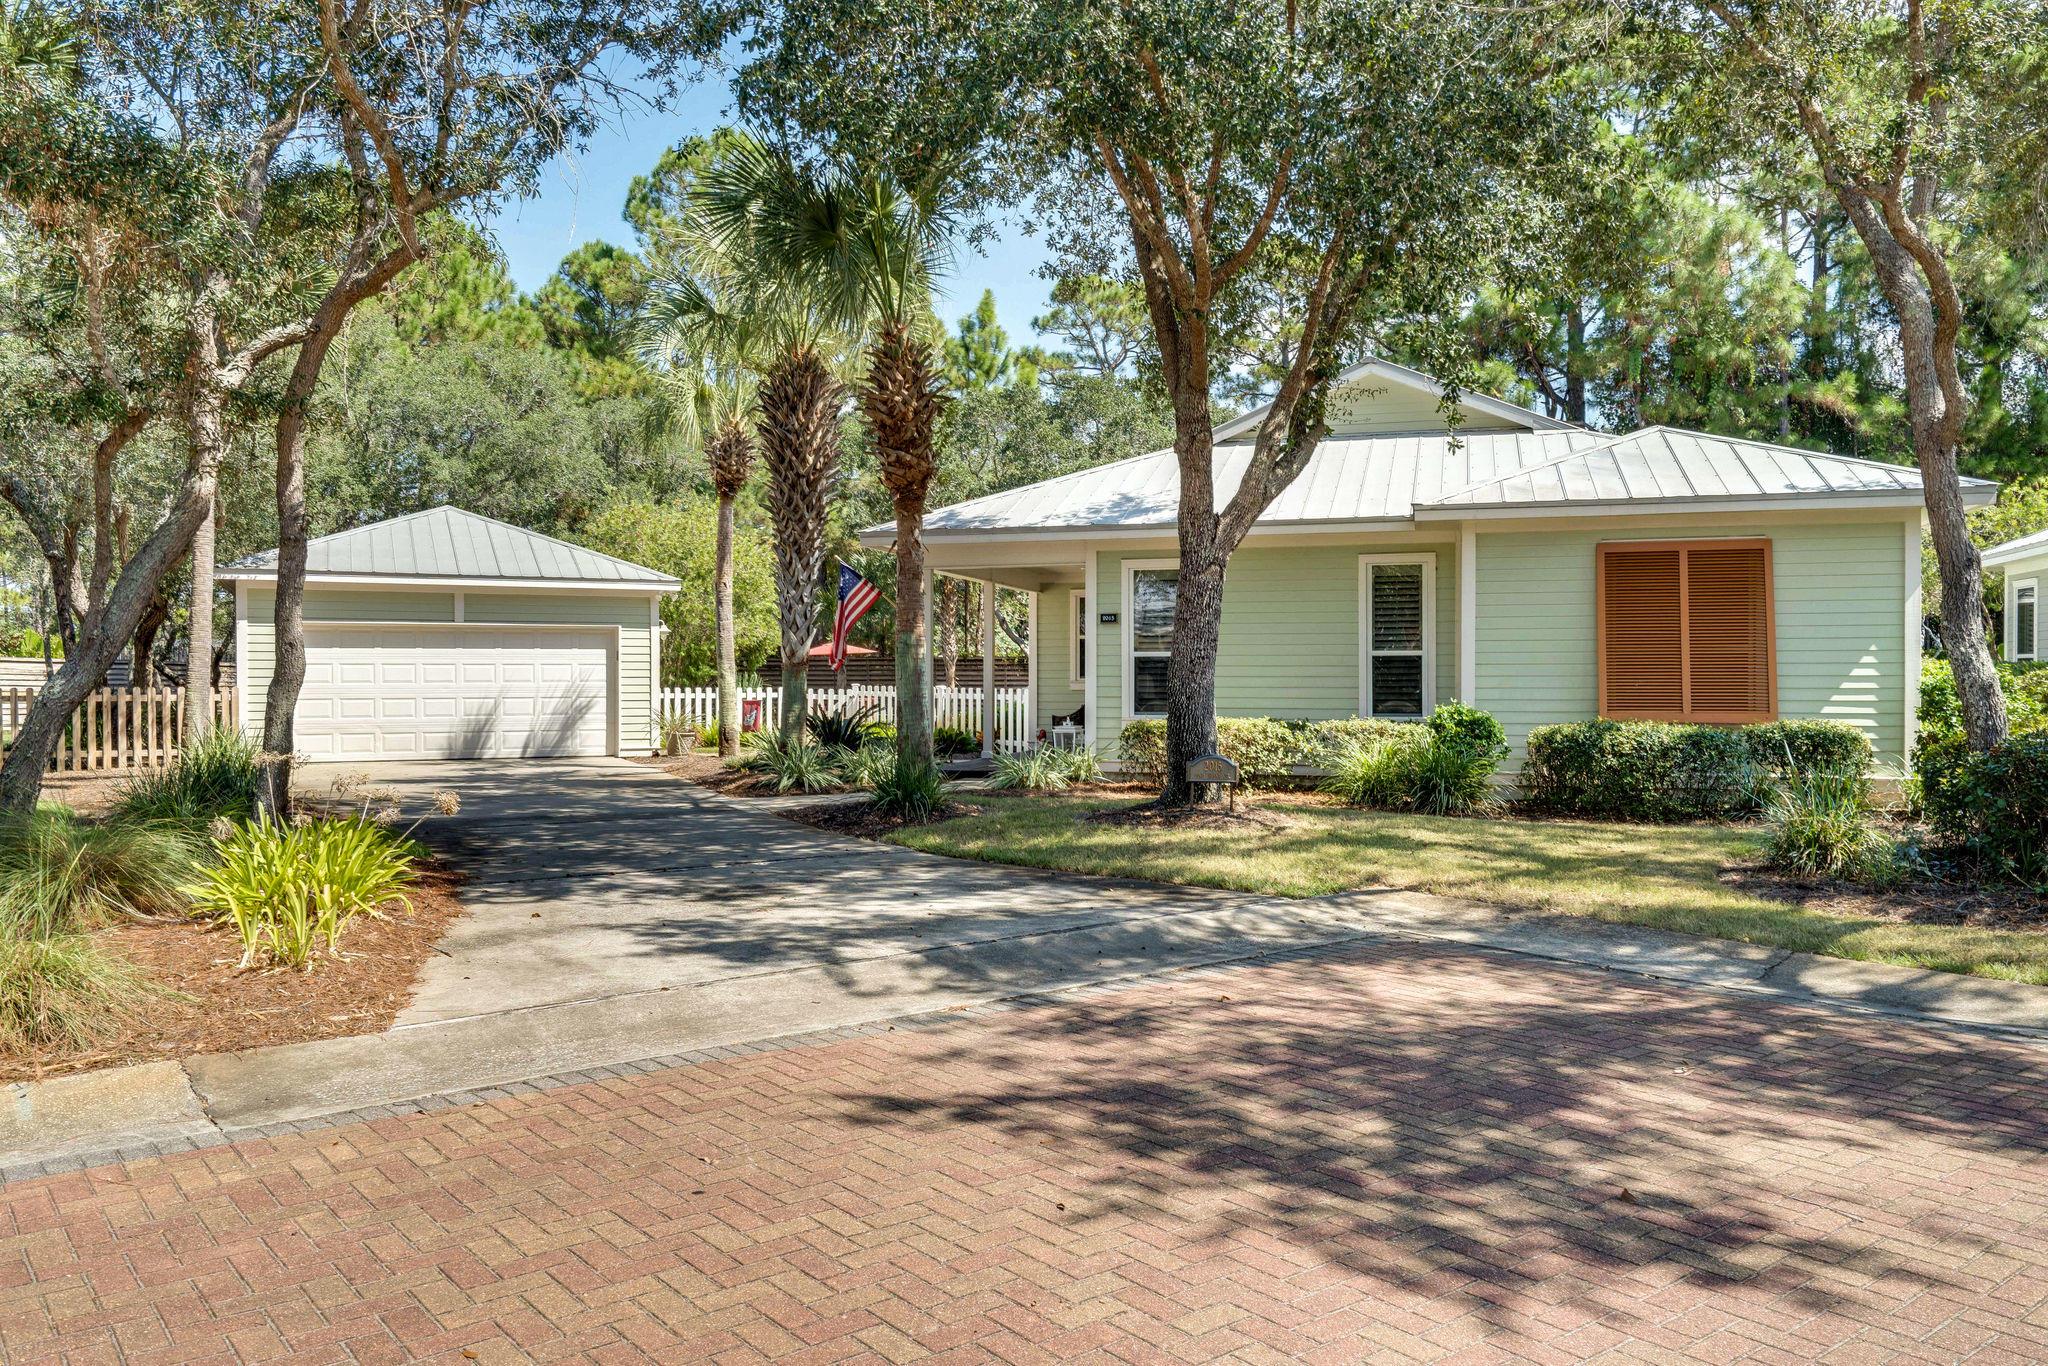 Photo of home for sale at 2015 Pine Island, Miramar Beach FL